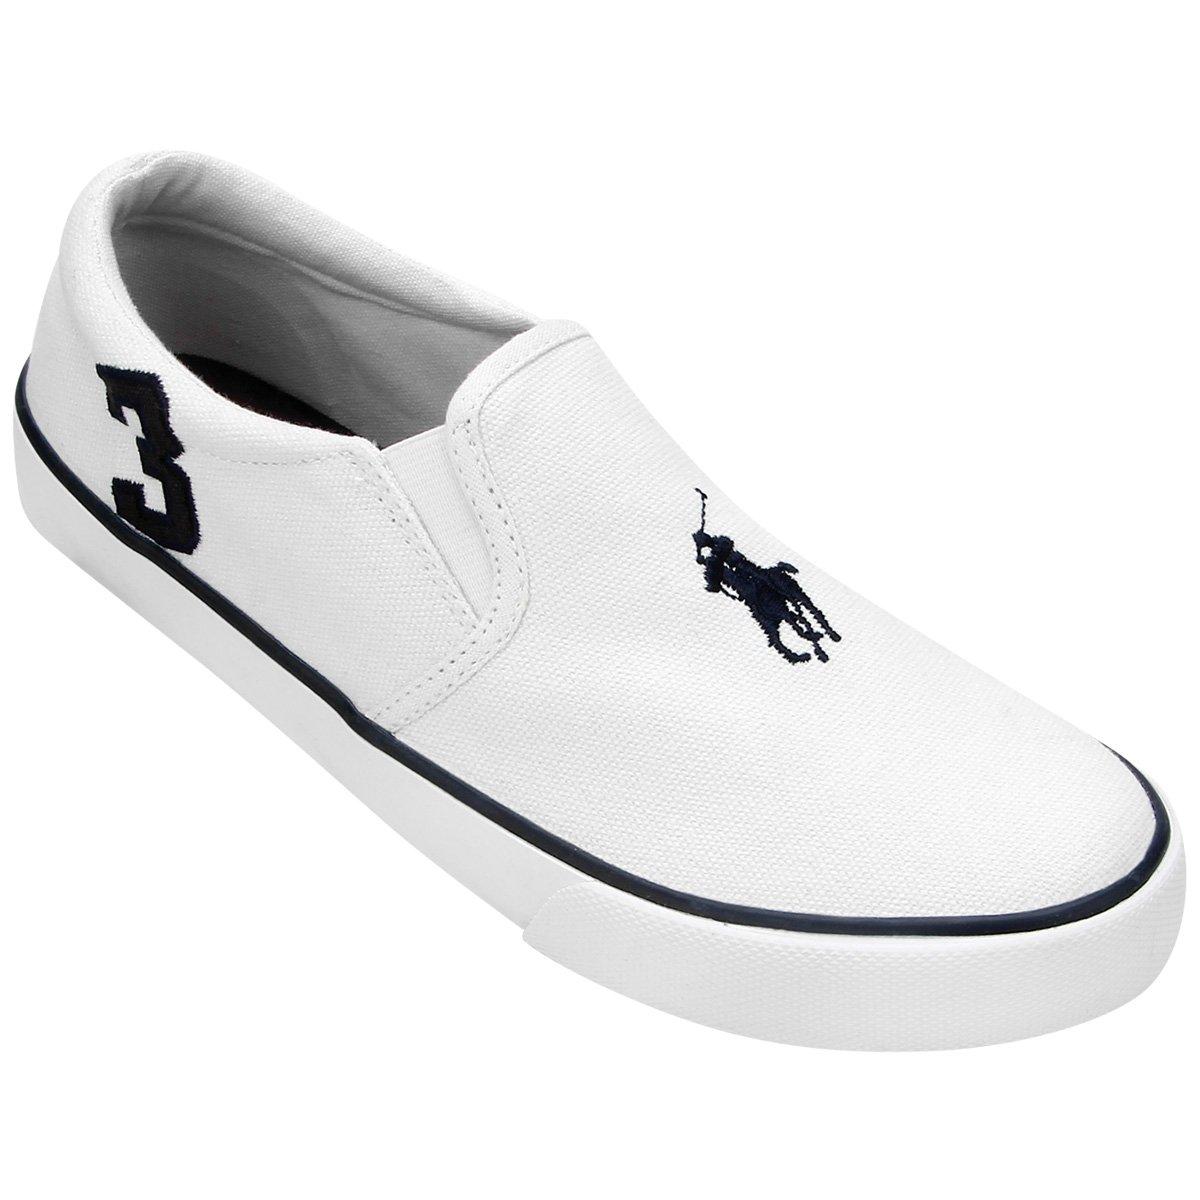 9fe1a1427572e Tênis Polo Ralph Lauren Seth Slip On Infantil - Compre Agora